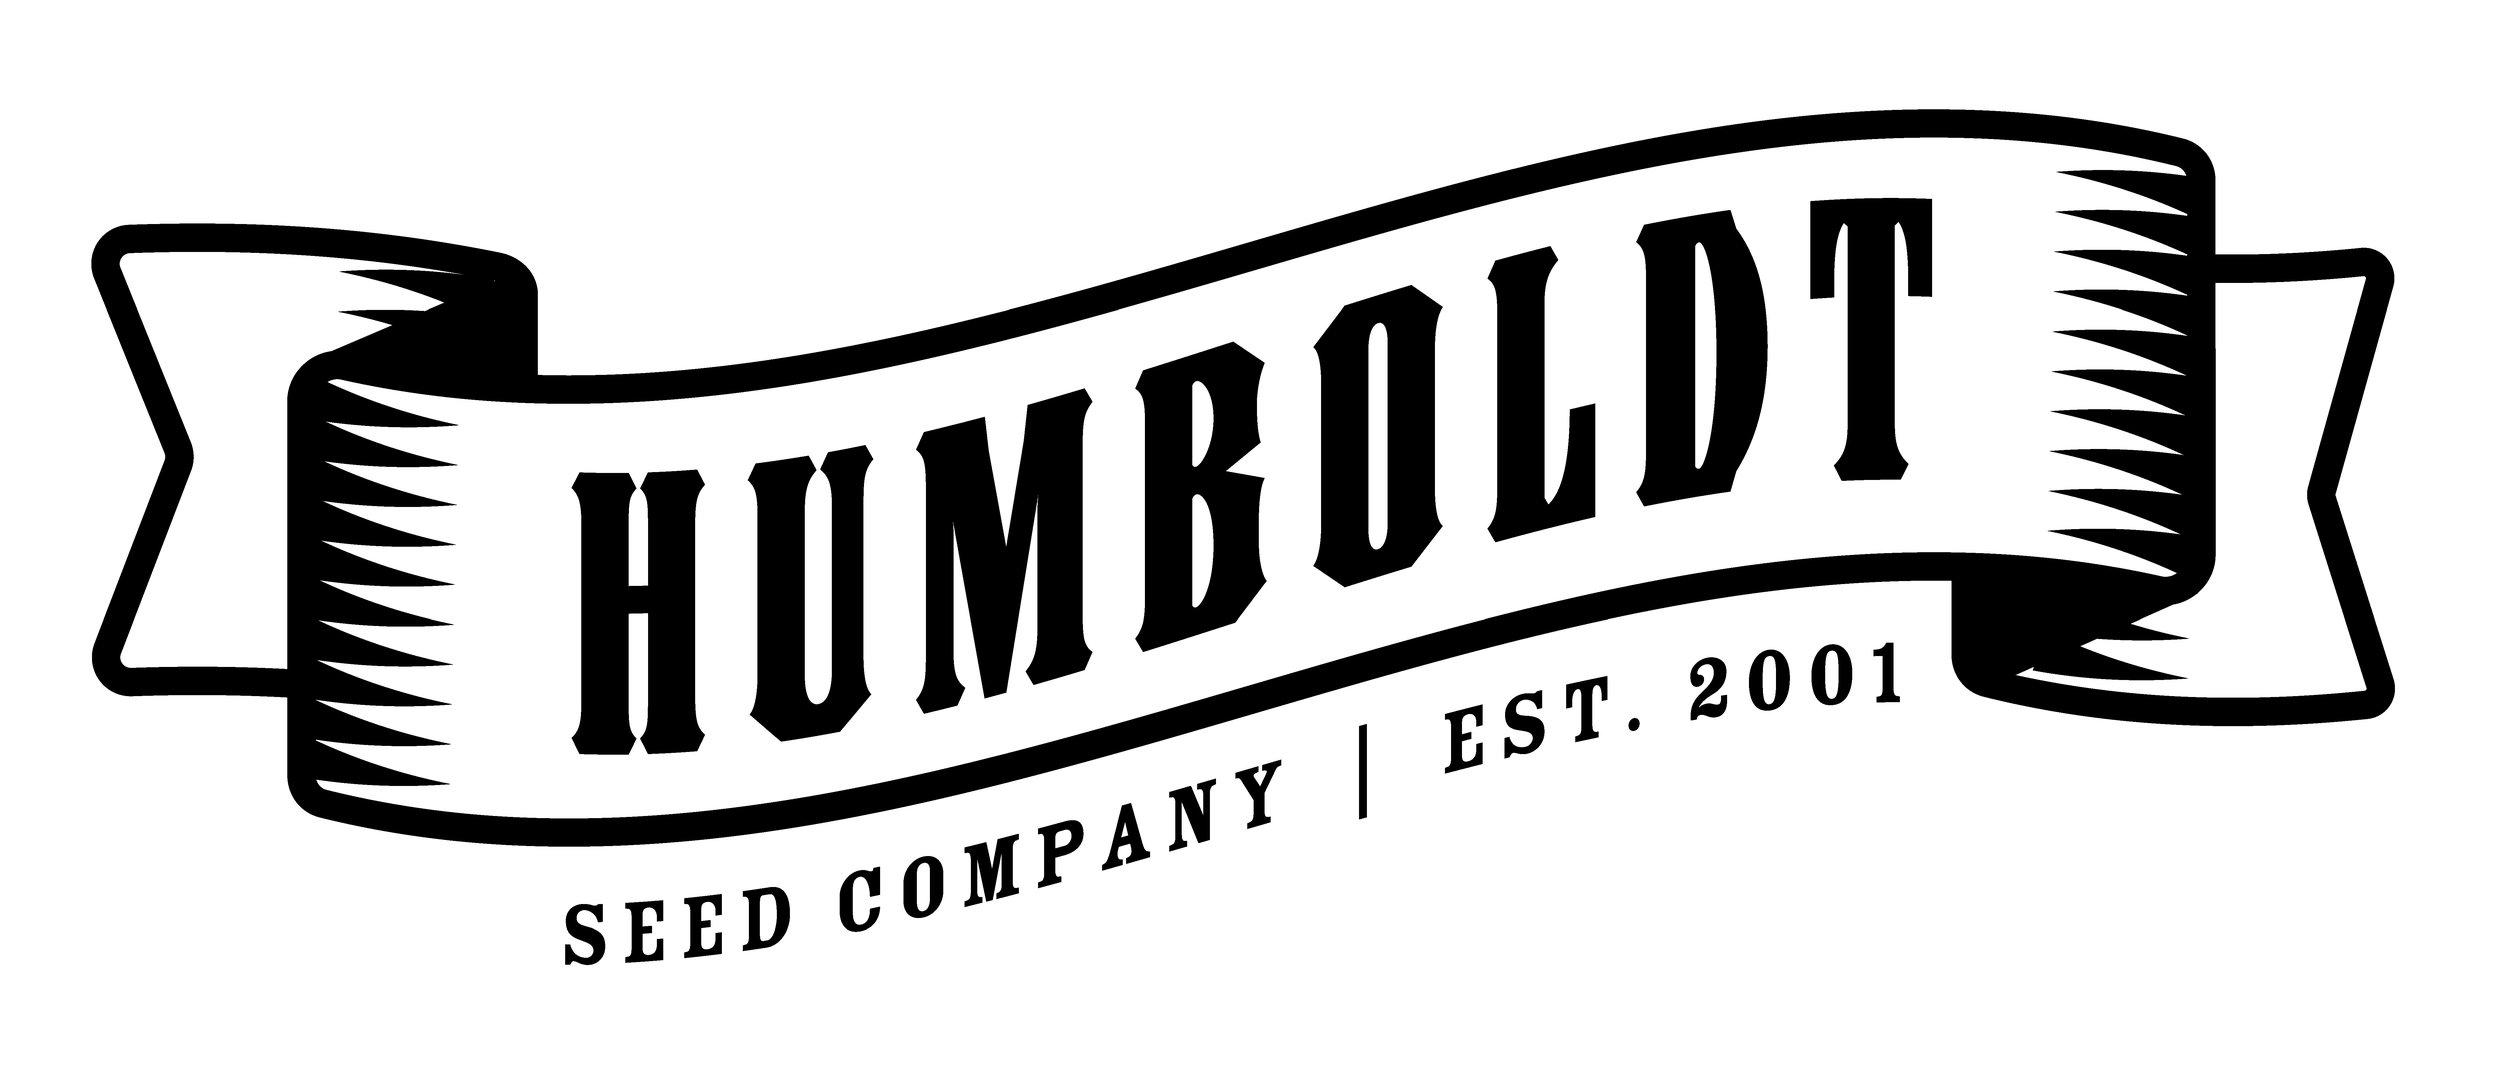 Humbodt Seed Company Logo.jpg